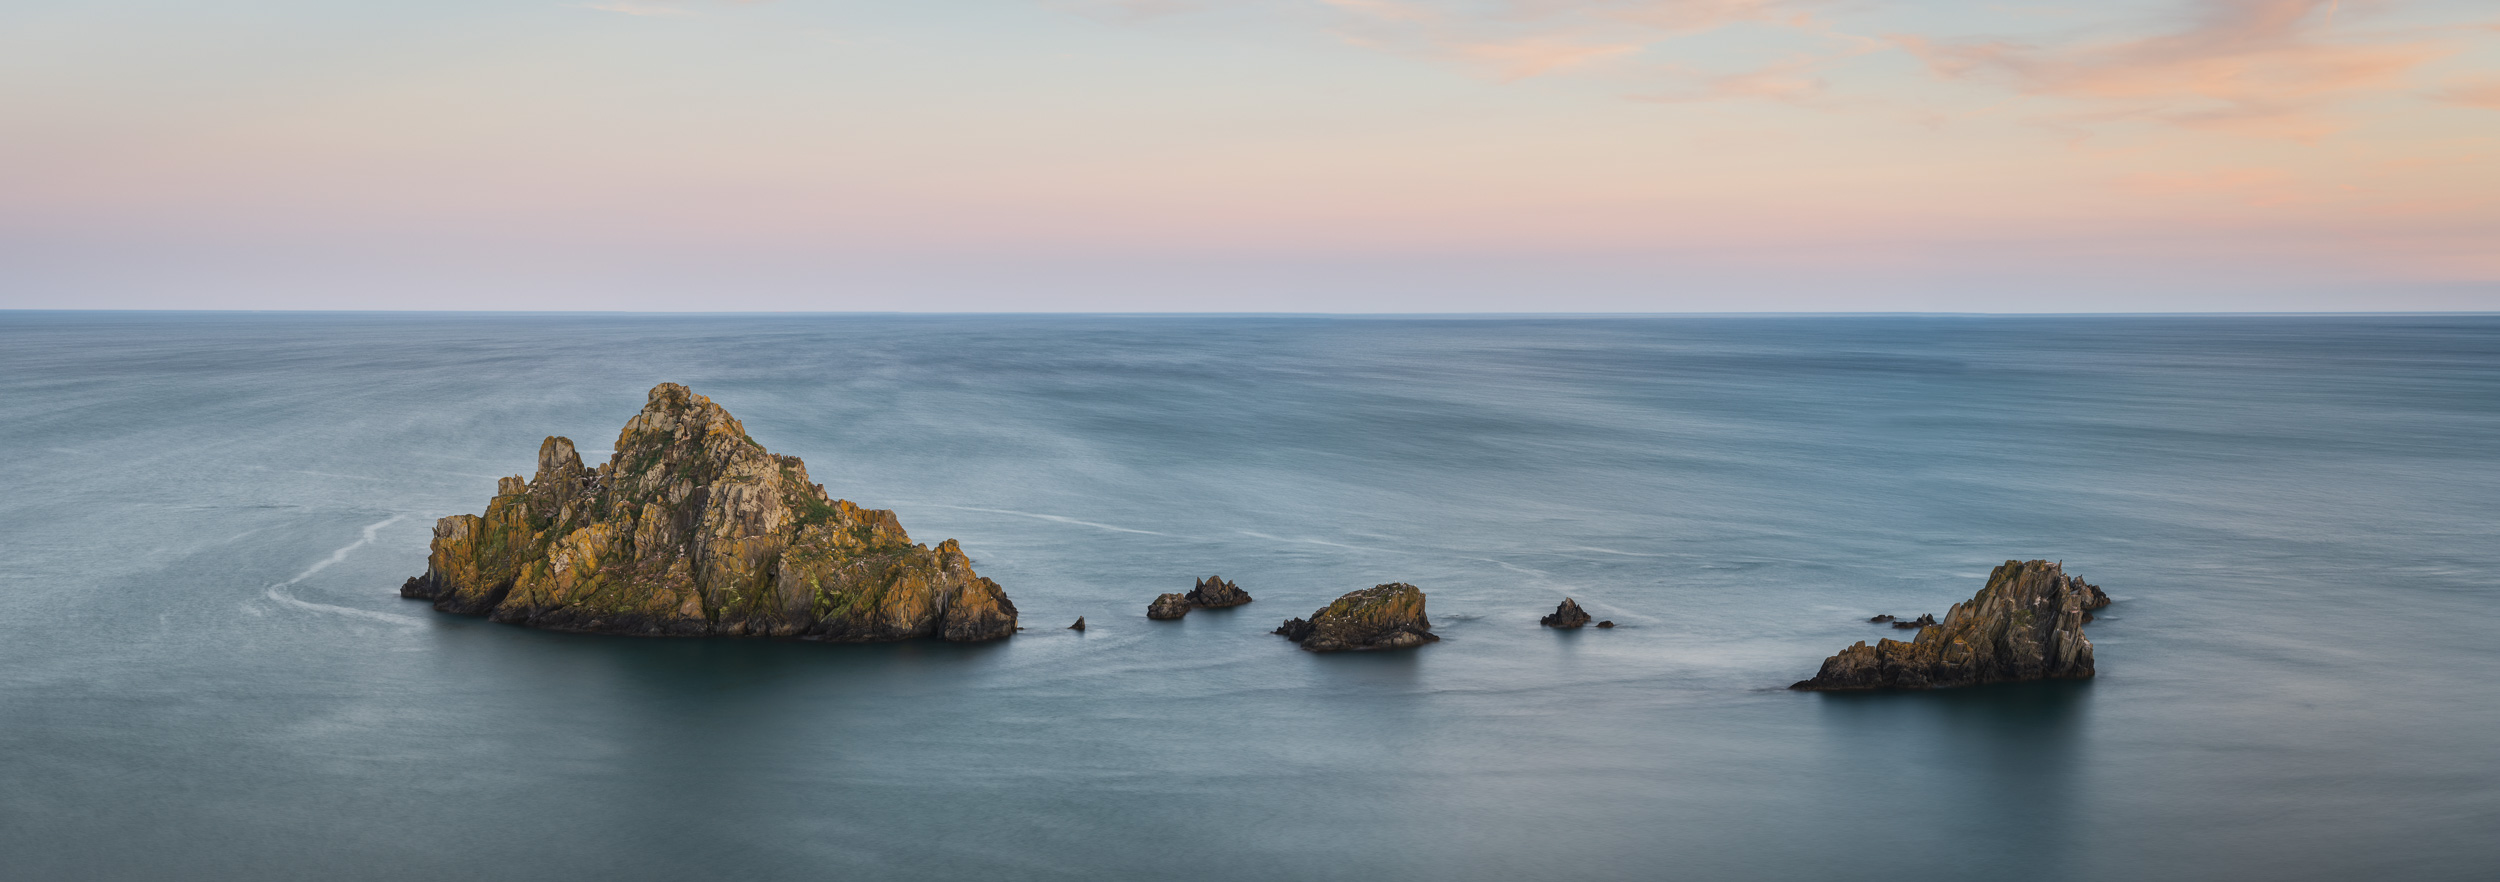 A Coastal Long Exposure Panorama  - Froward Point, Devon: Nikon D850, Nikkor 70-200 mm f/2.8 at 70 mm, 20 secs at f/11, ISO 64, Lee Filters Circular Polariser. 5 Image stitch.